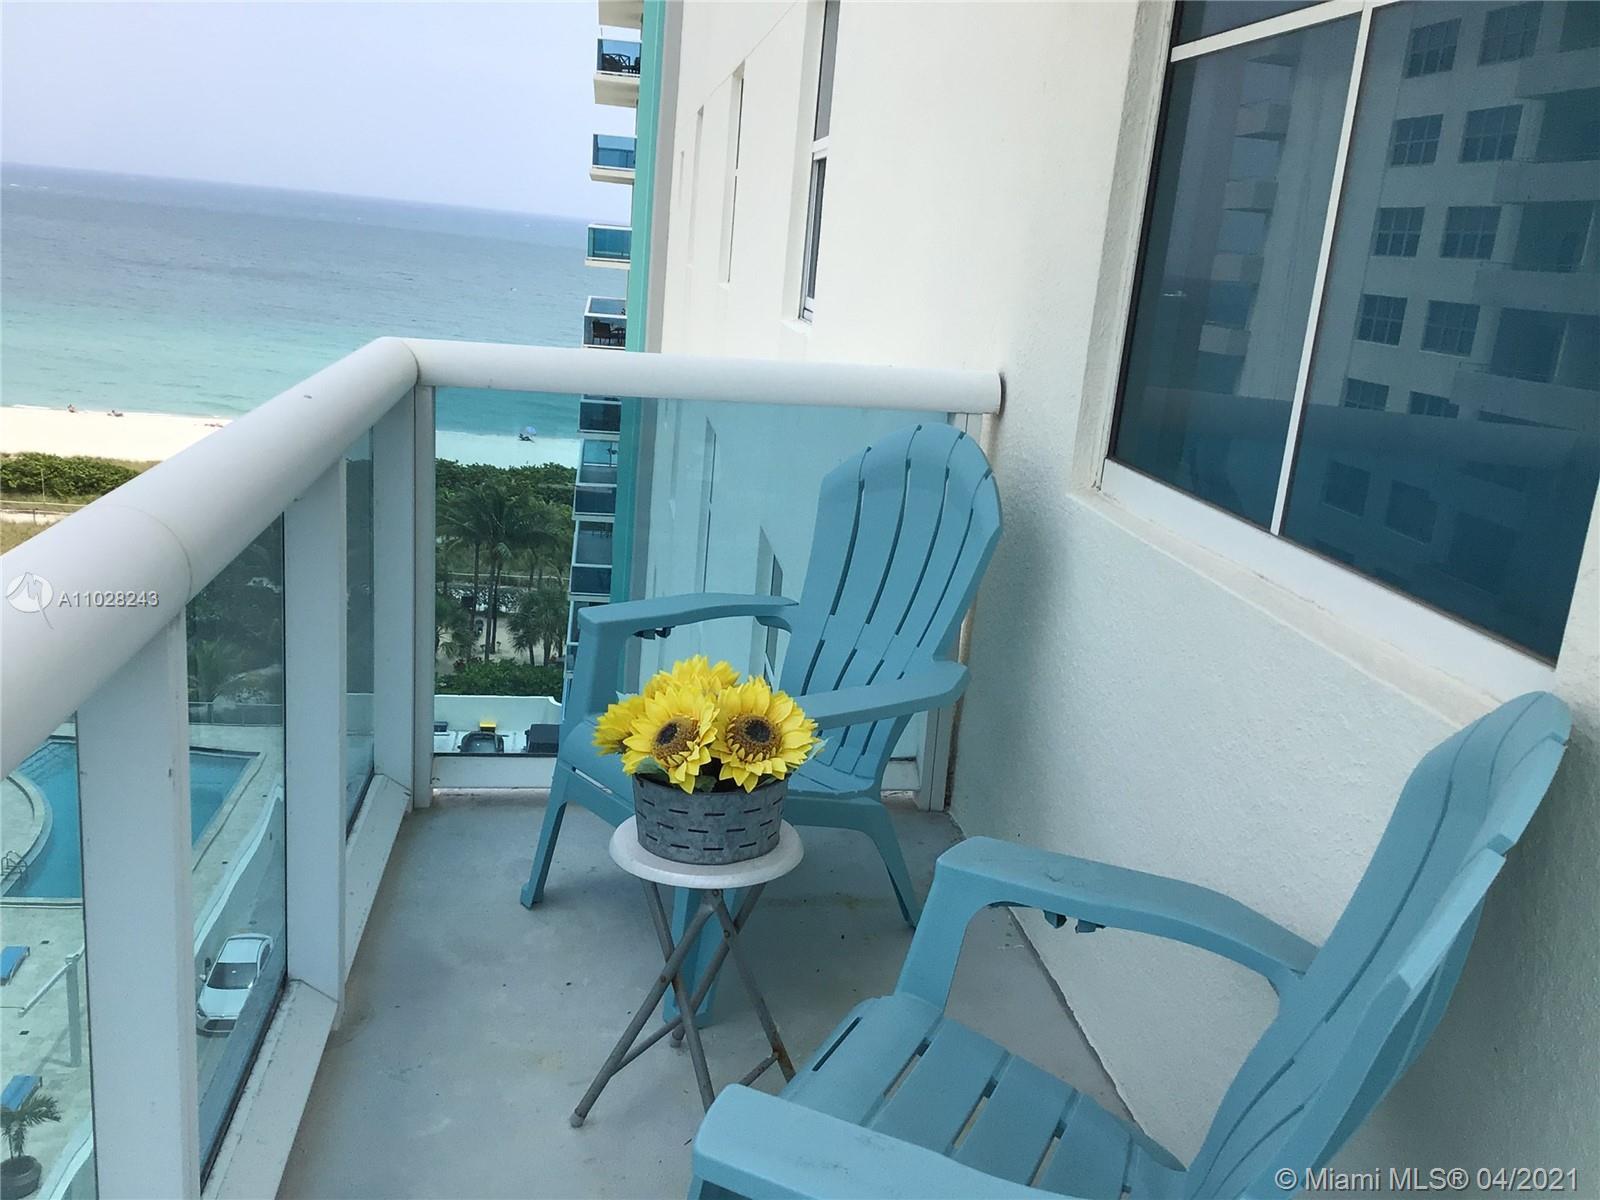 9201 Collins Ave Unit 921, Surfside, Florida 33154